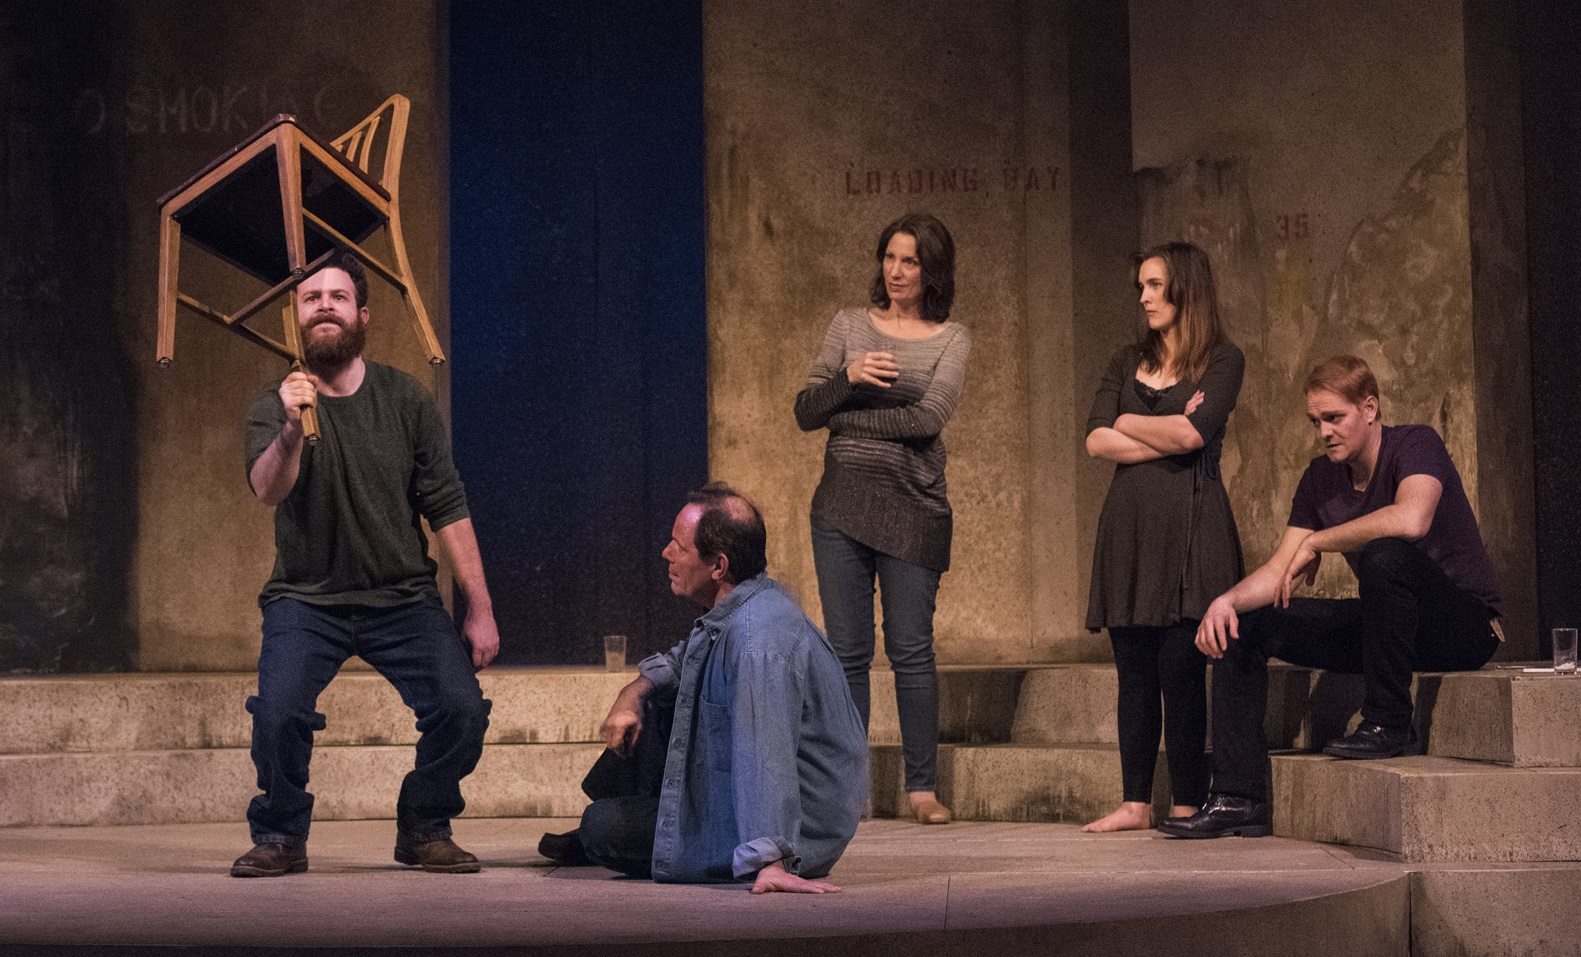 Adam Yellen, left, John Fredo, Debbie Pappas Sham, Renee Landrigan and  Adriano Gato star in 'A View from the Bridge' at Kavinoky Theatre.